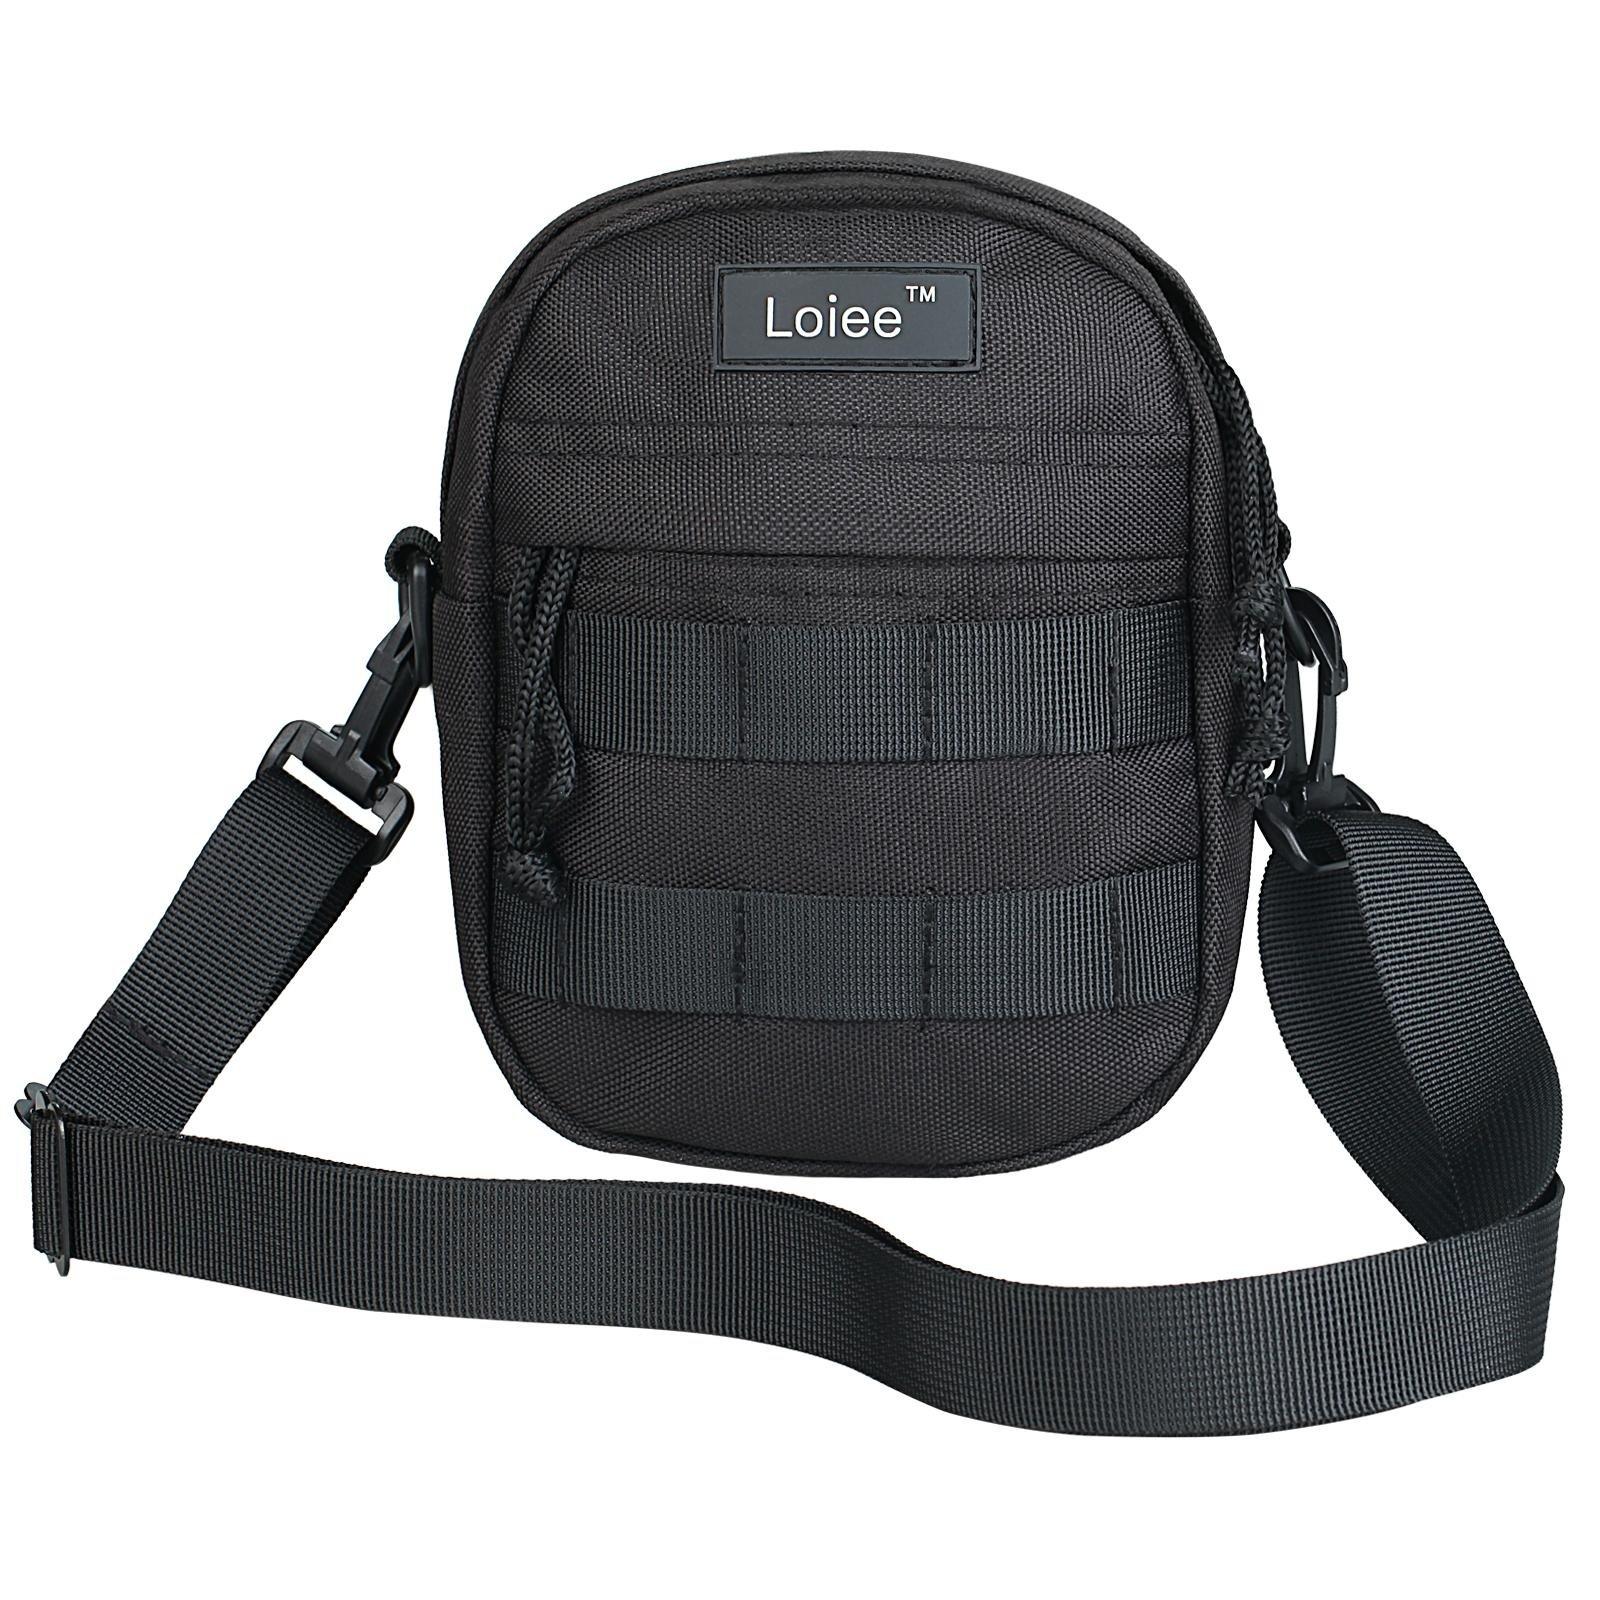 Loiee Mini Nylon Messenger Bag,Samll Shoulder Bag